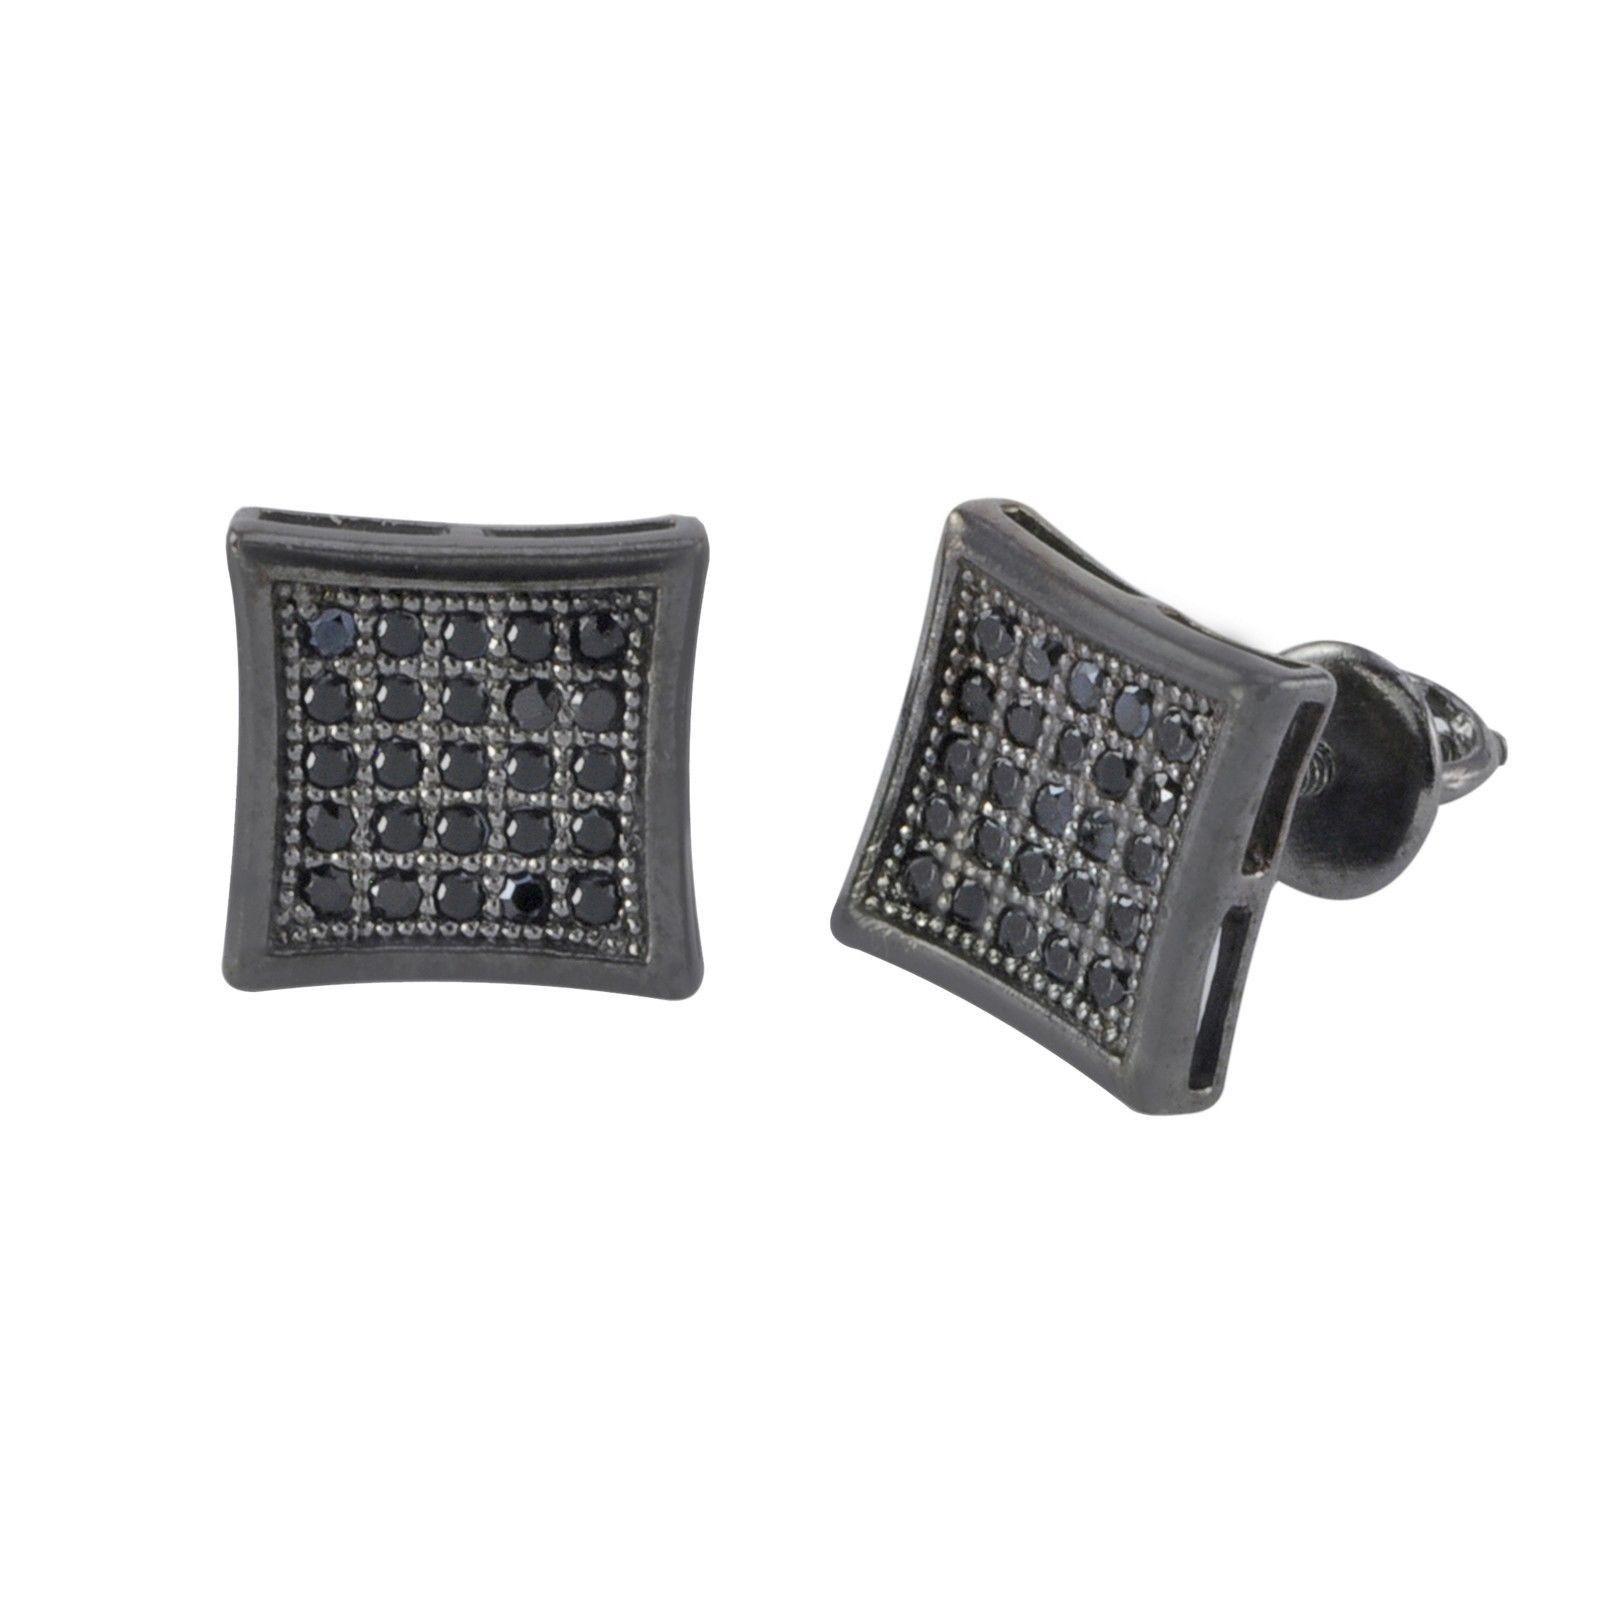 Micropave Screwback Earrings Black CZ Cubic Zirconia 9mm Kite Shaped